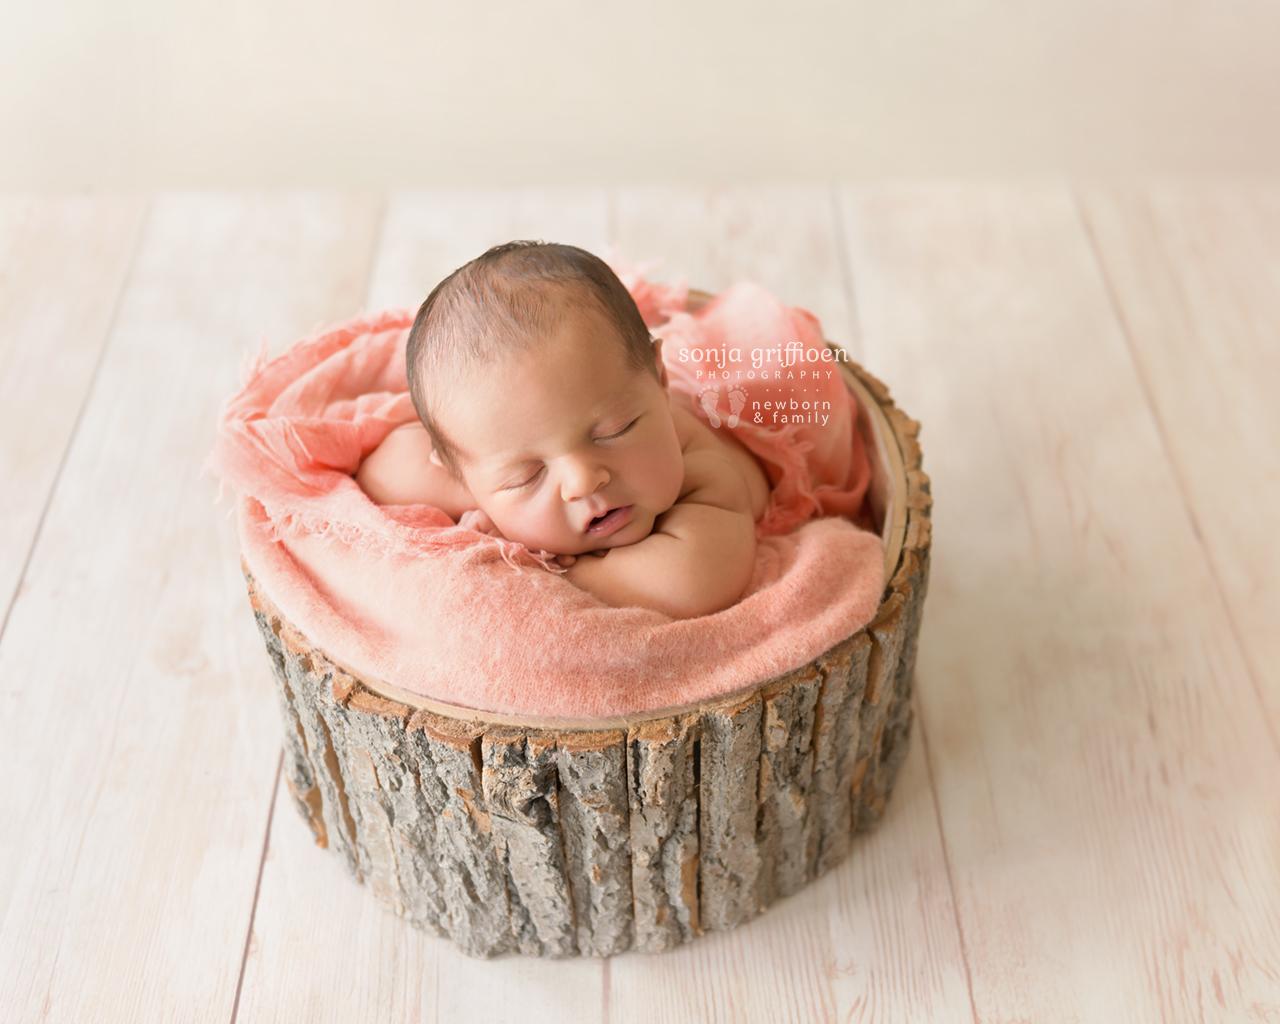 Emma-Newborn-Brisbane-Newborn-Photographer-Sonja-Griffioen-12.jpg